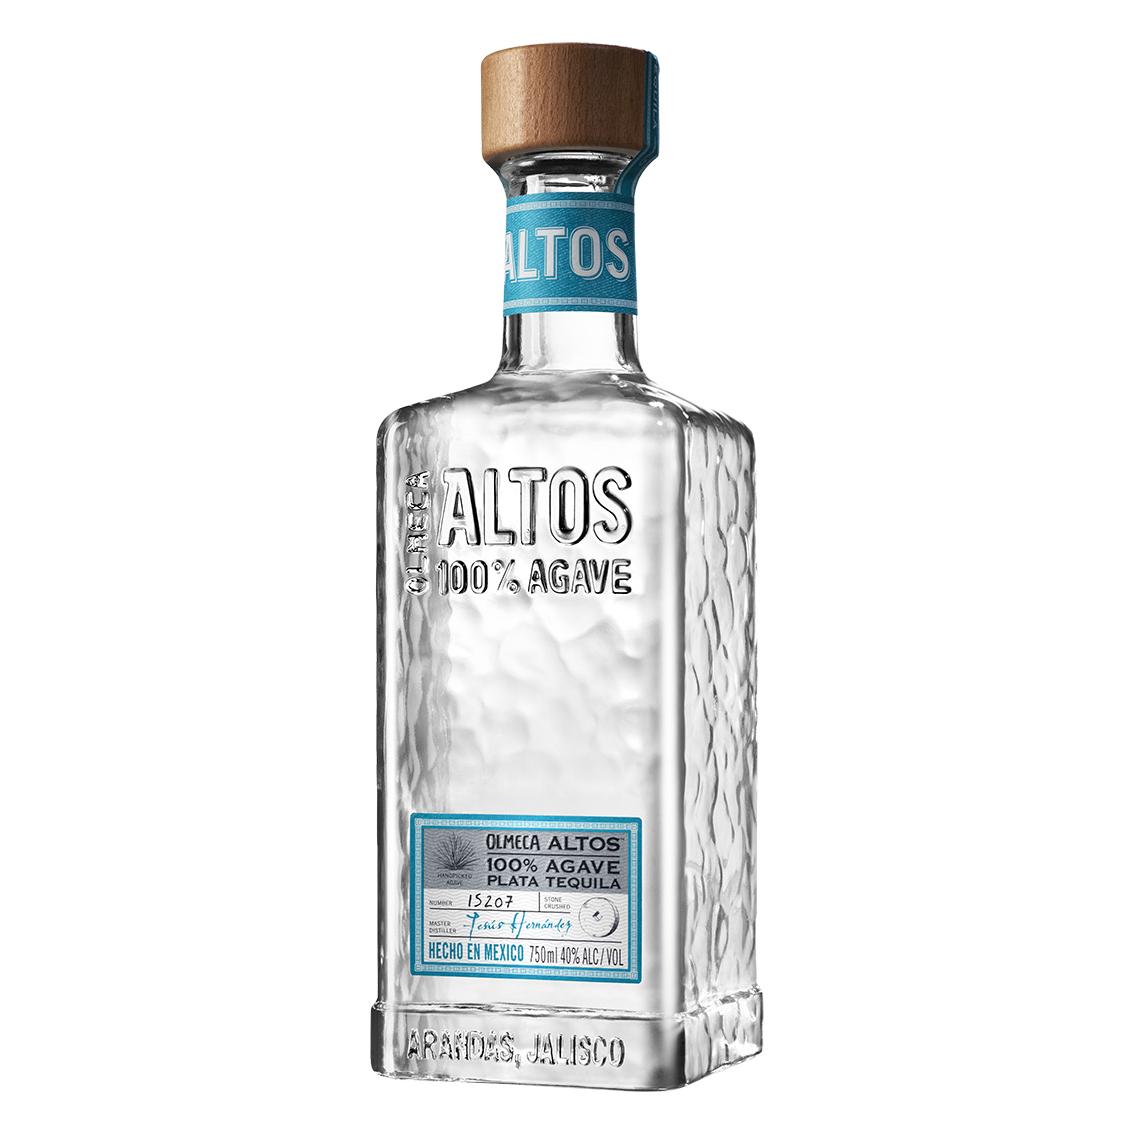 garrafa de altos tequila plata